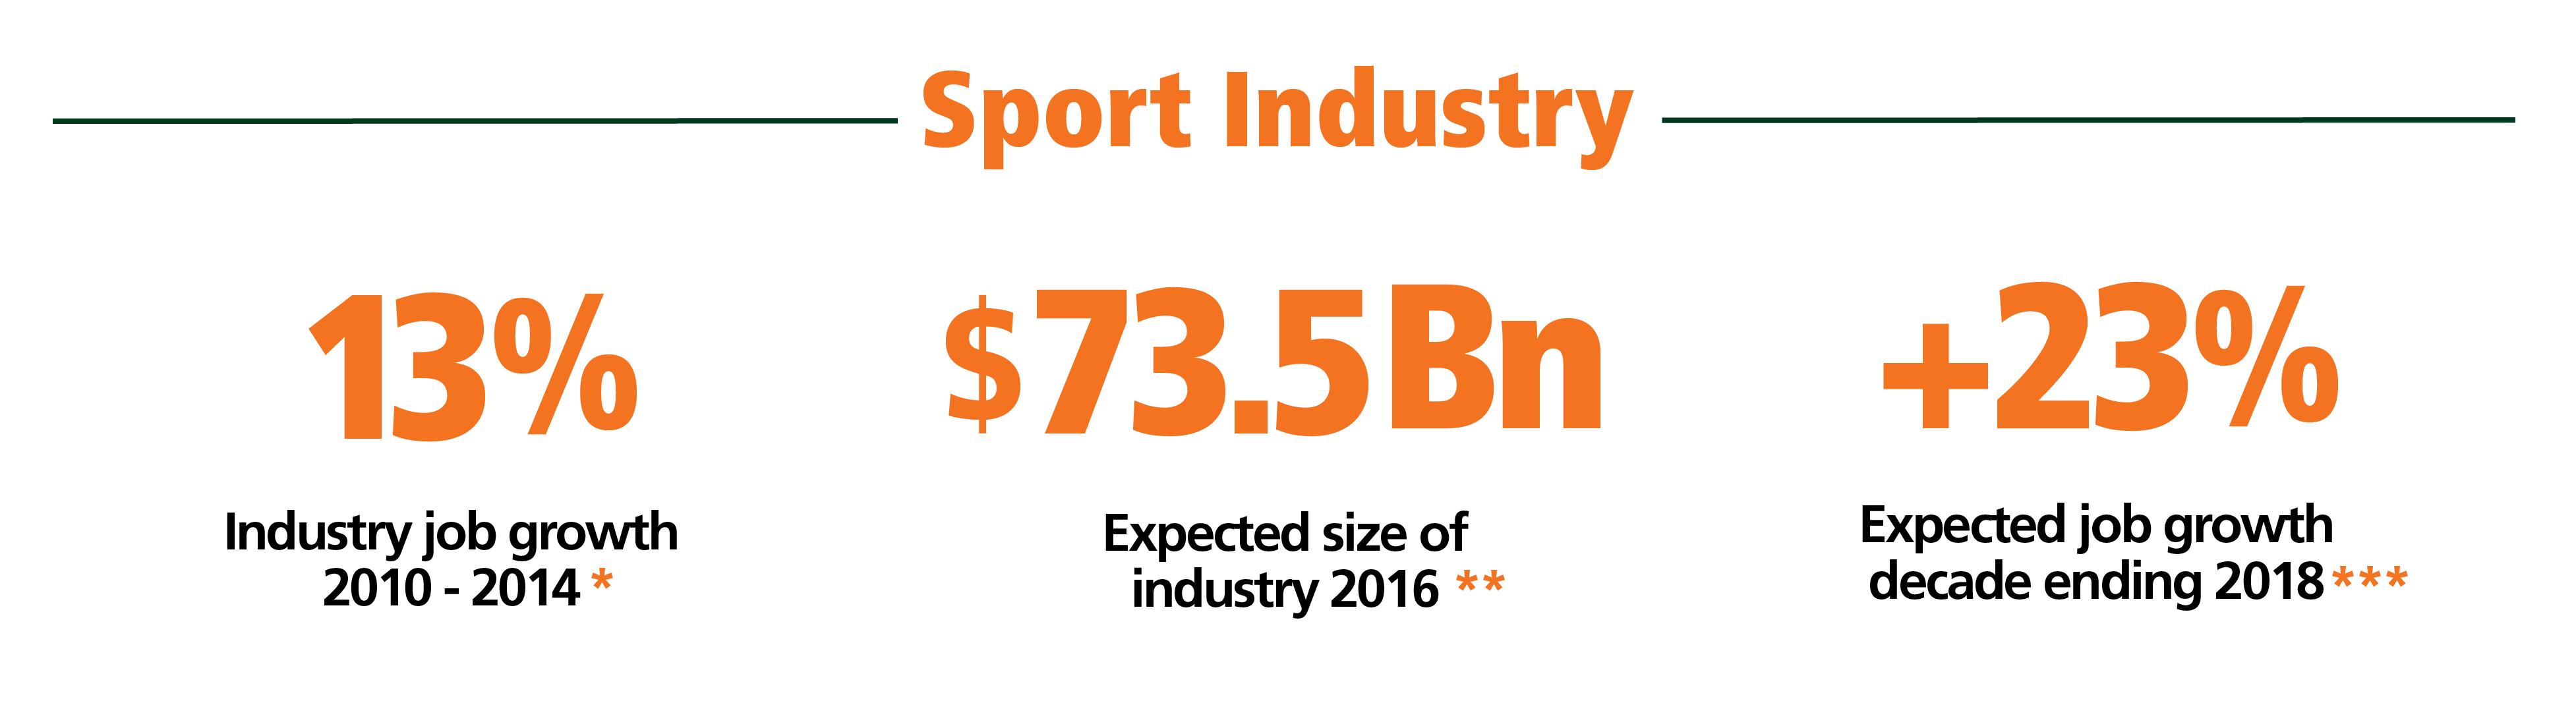 sport_ind_stats